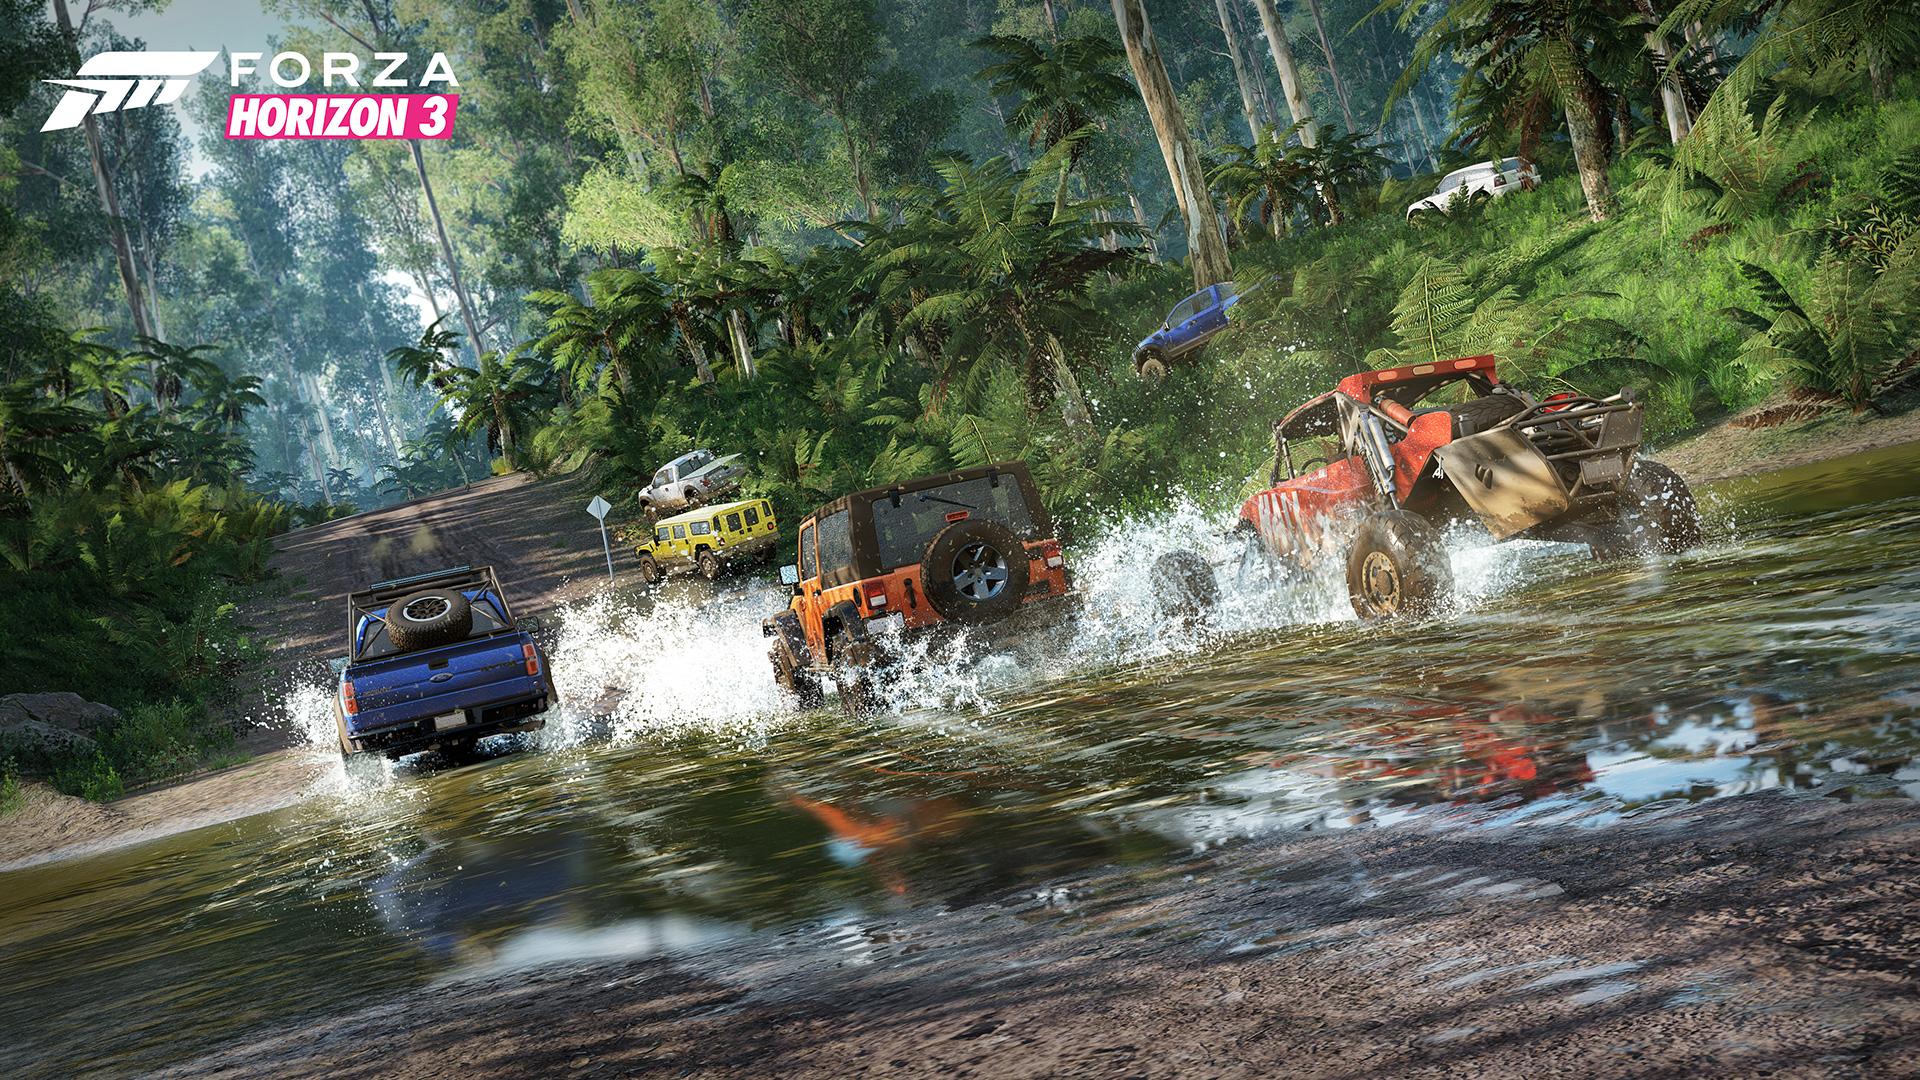 Race through the river.